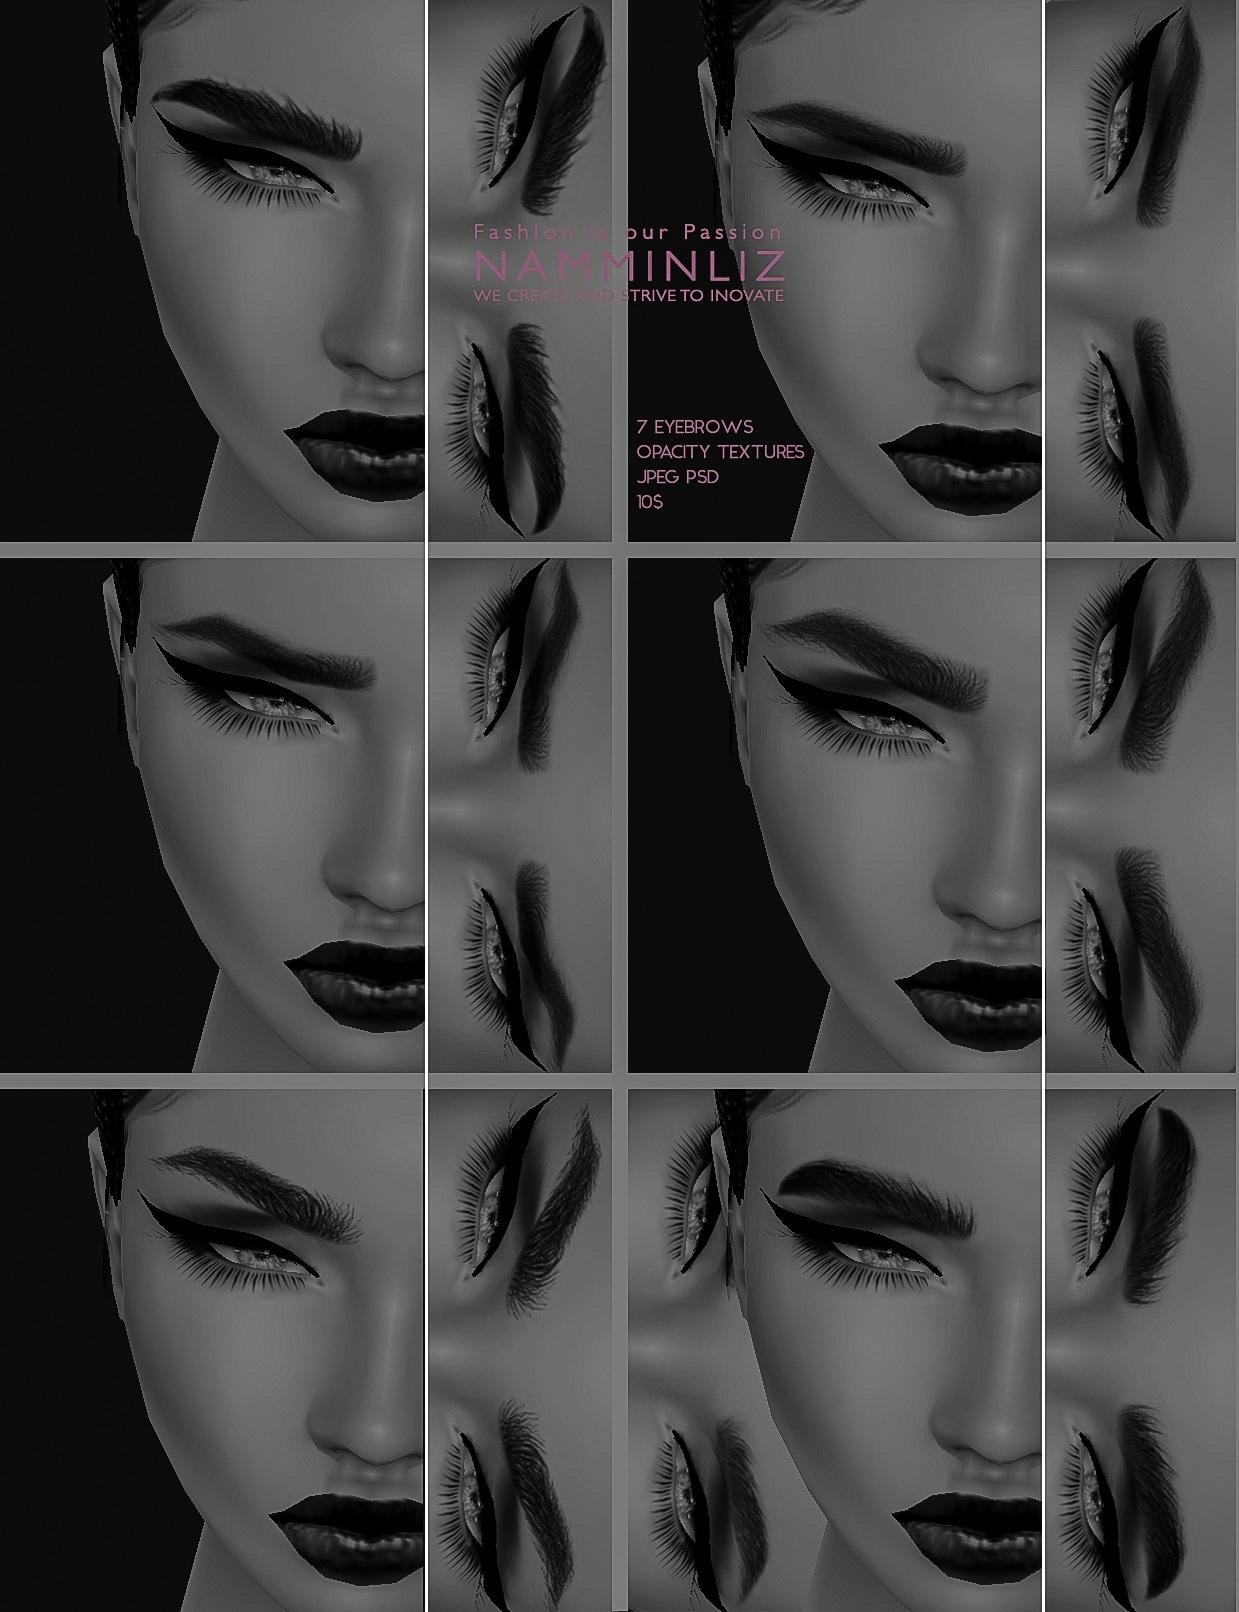 7 Eyebrows Opacity textures JPEG PSD